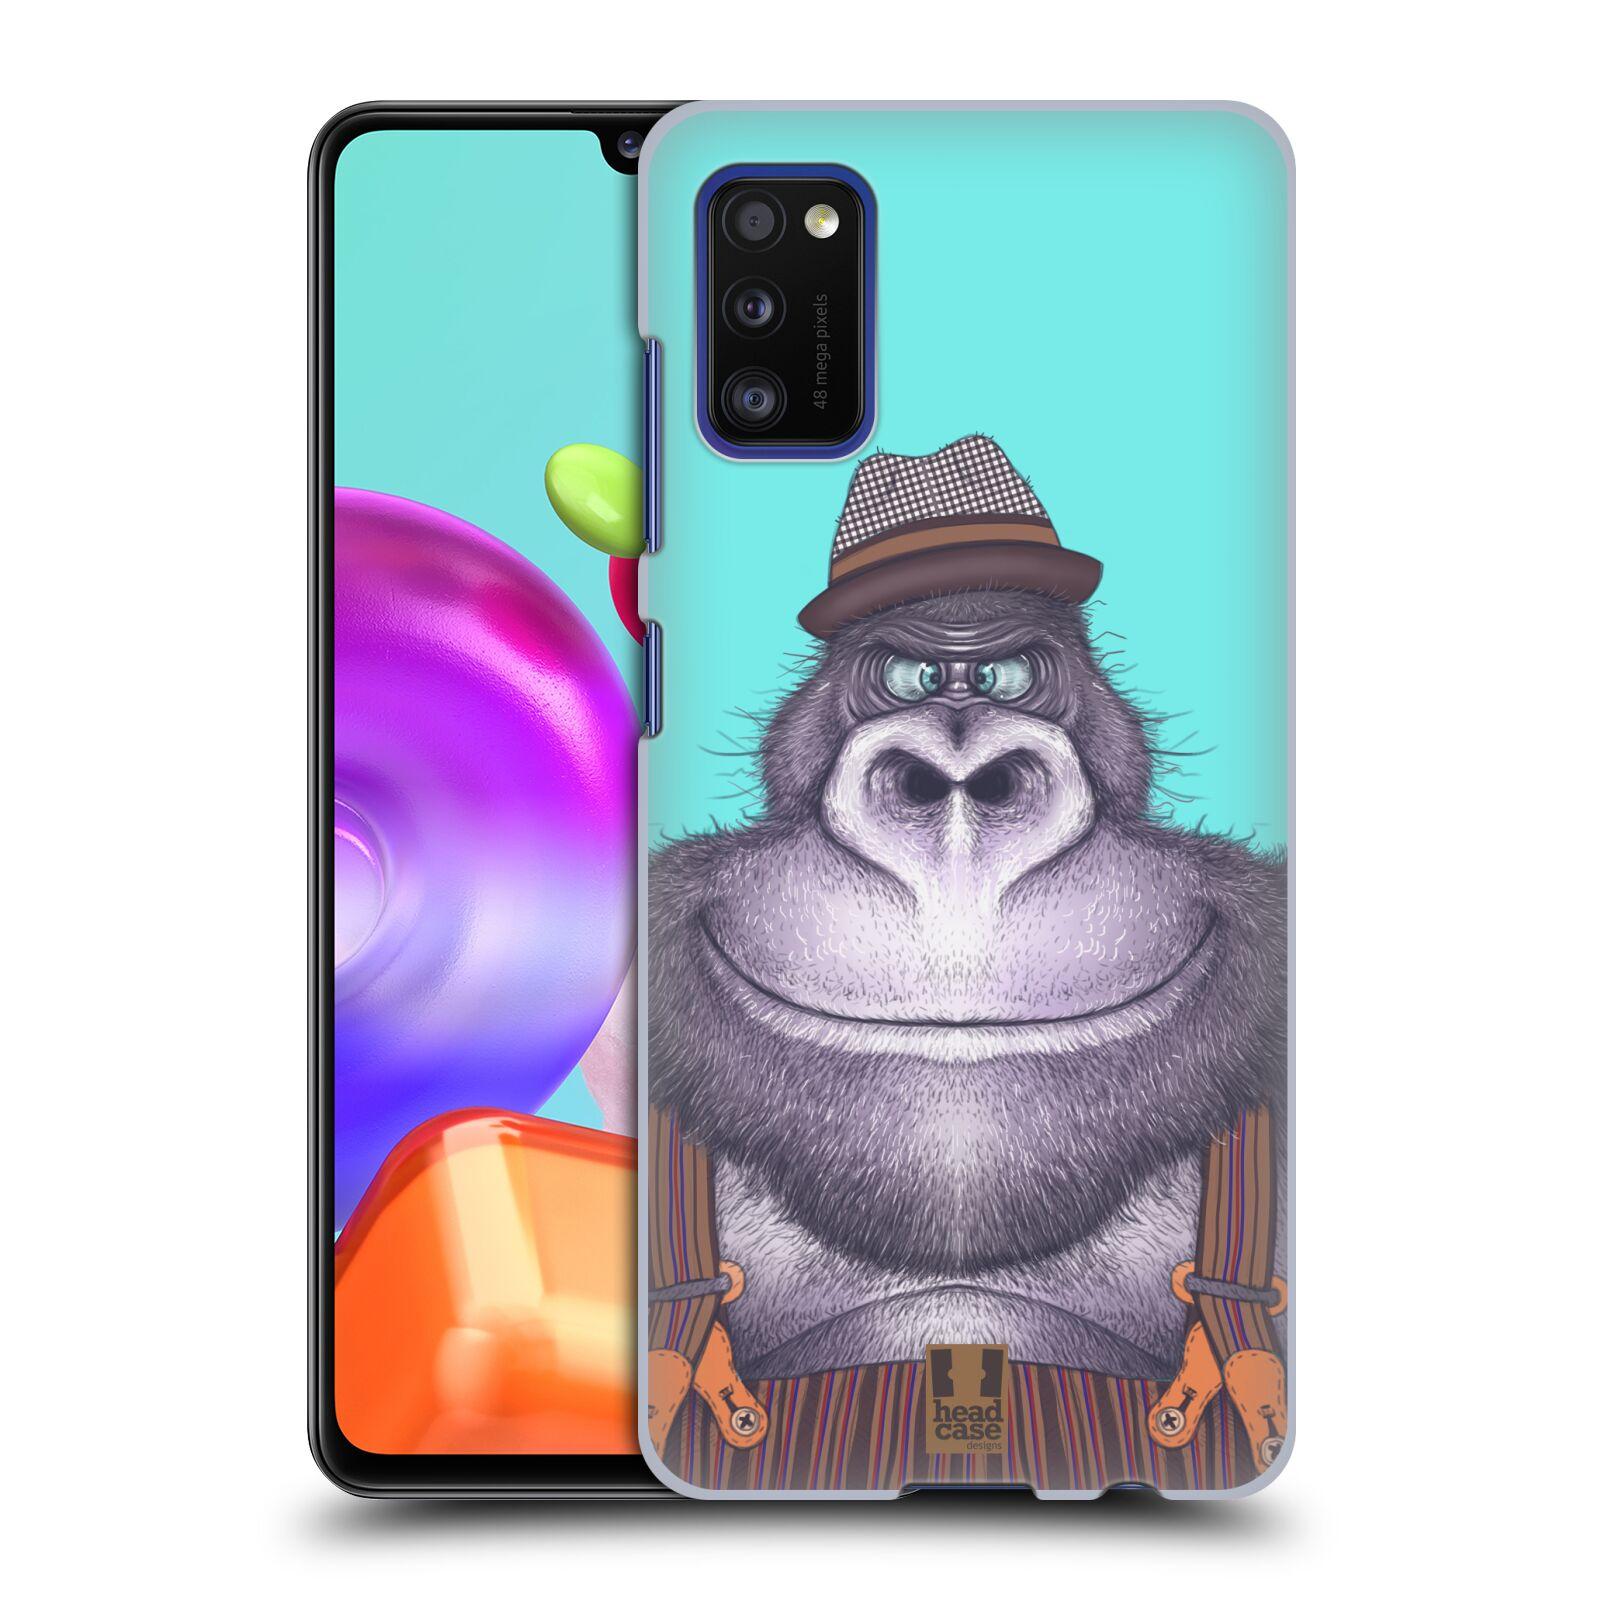 Zadní kryt na mobil Samsung Galaxy A41 vzor Kreslená zvířátka gorila